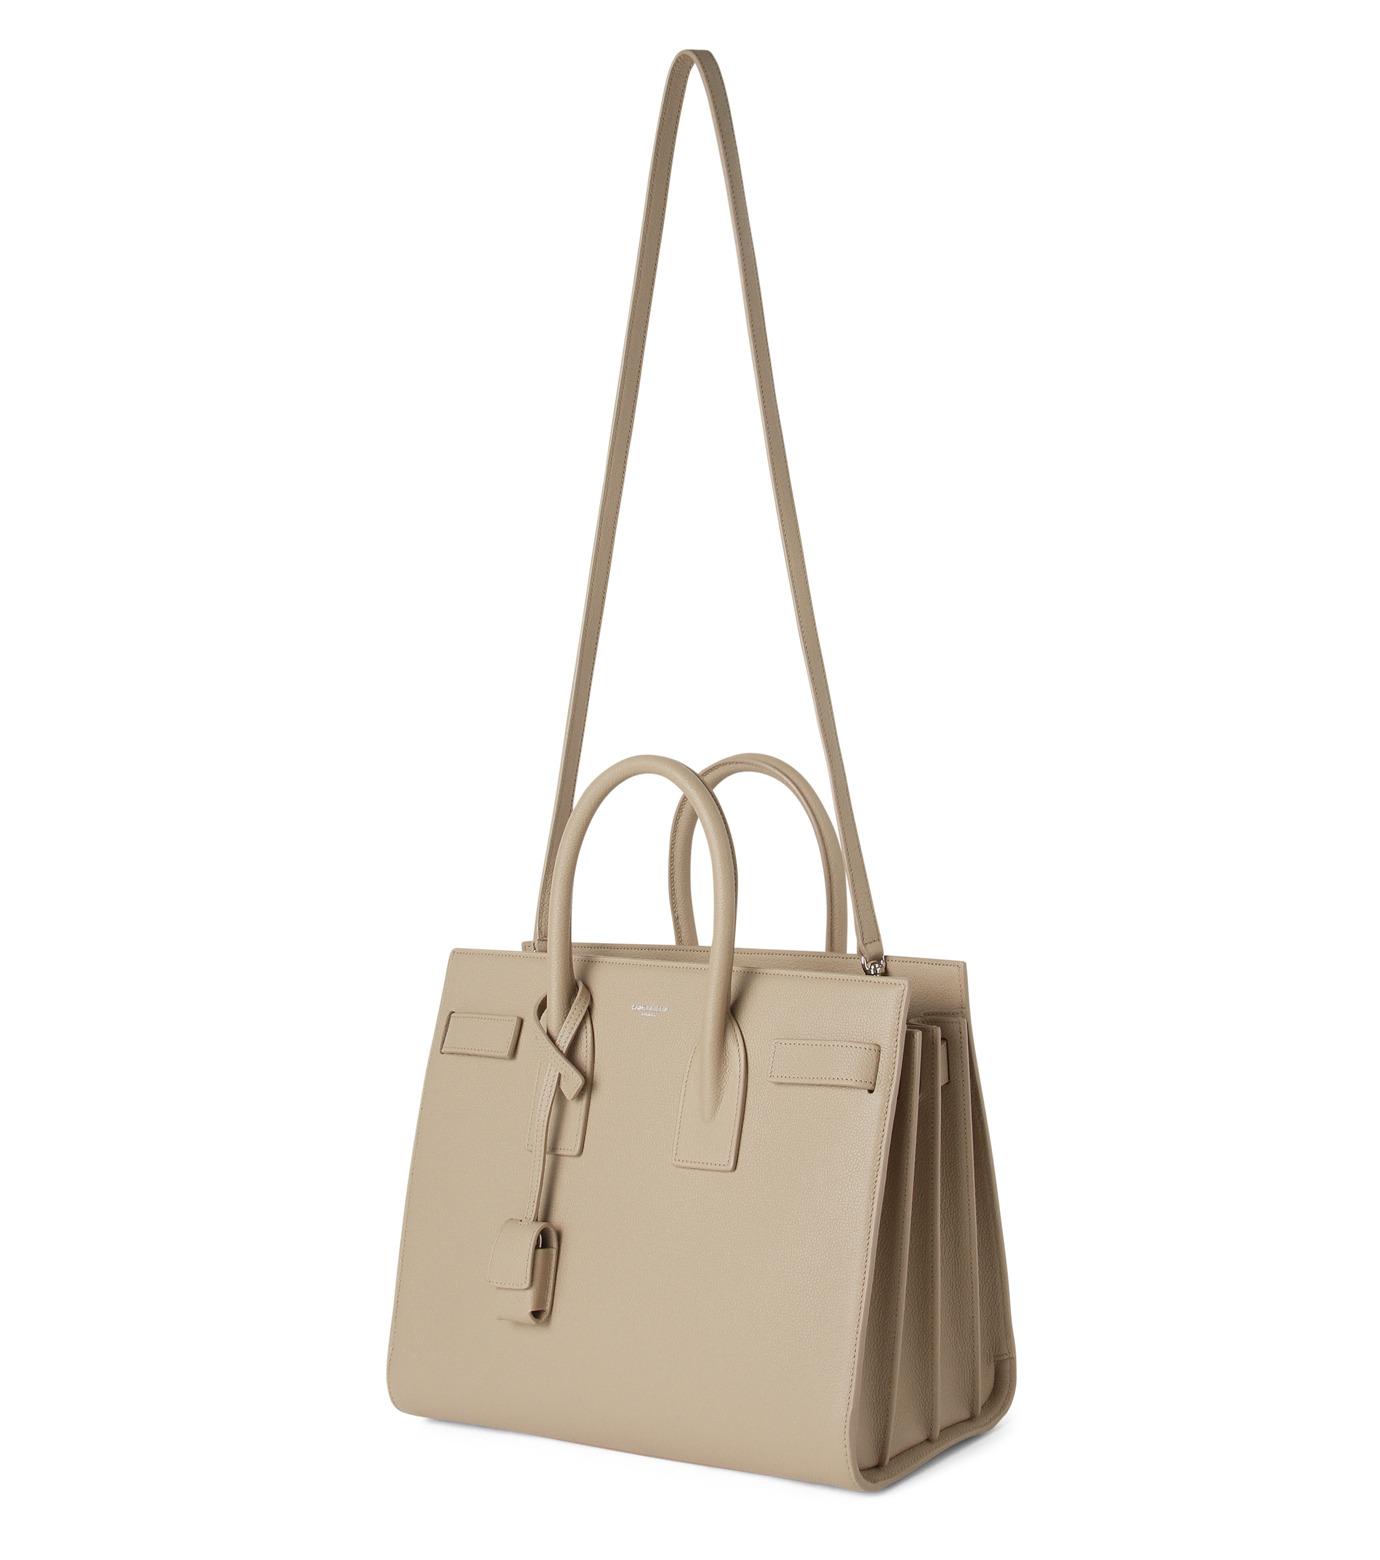 SAINT LAURENT(サンローラン)のSac de Jour Small-BEIGE(ハンドバッグ/hand bag)-398709-B680N-52 拡大詳細画像2